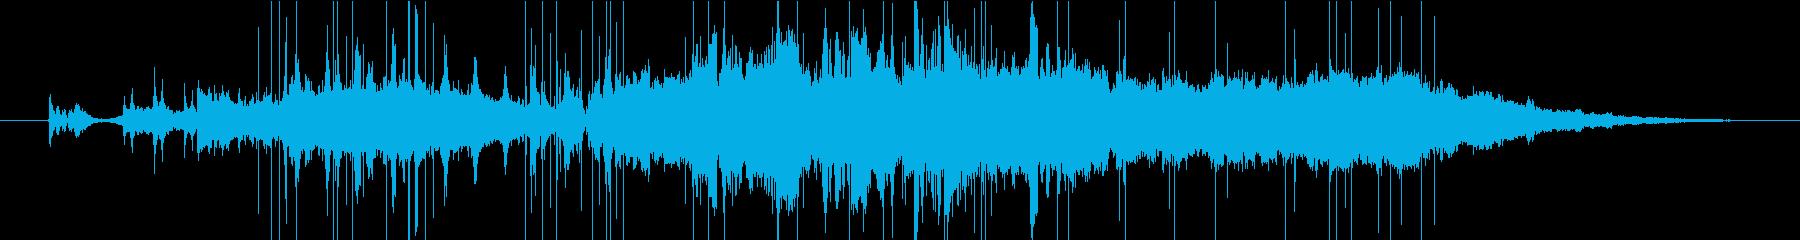 TARIの再生済みの波形